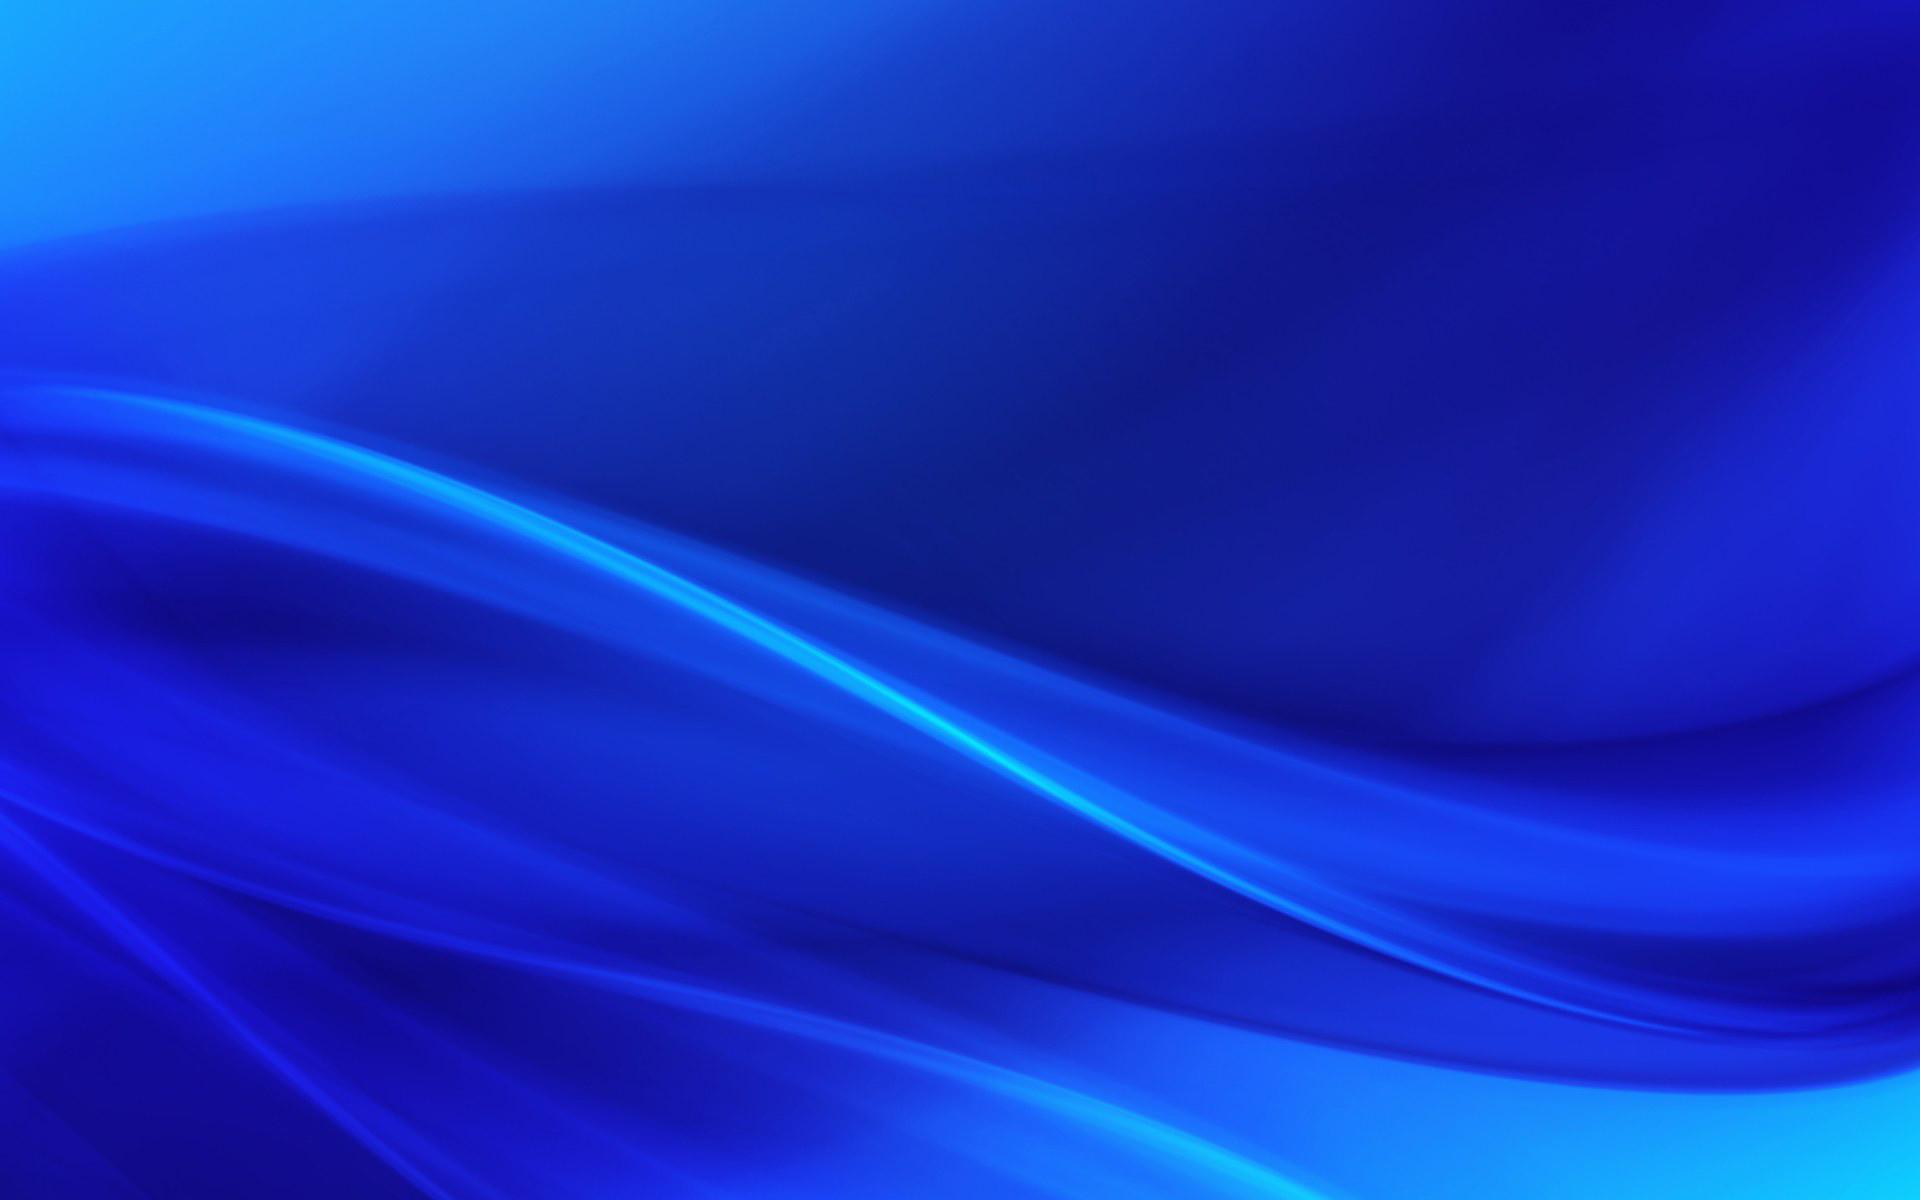 Fall Color Wallpaper For Desktop Free Photo Blue Waves Wallpaper Photoshop Shape